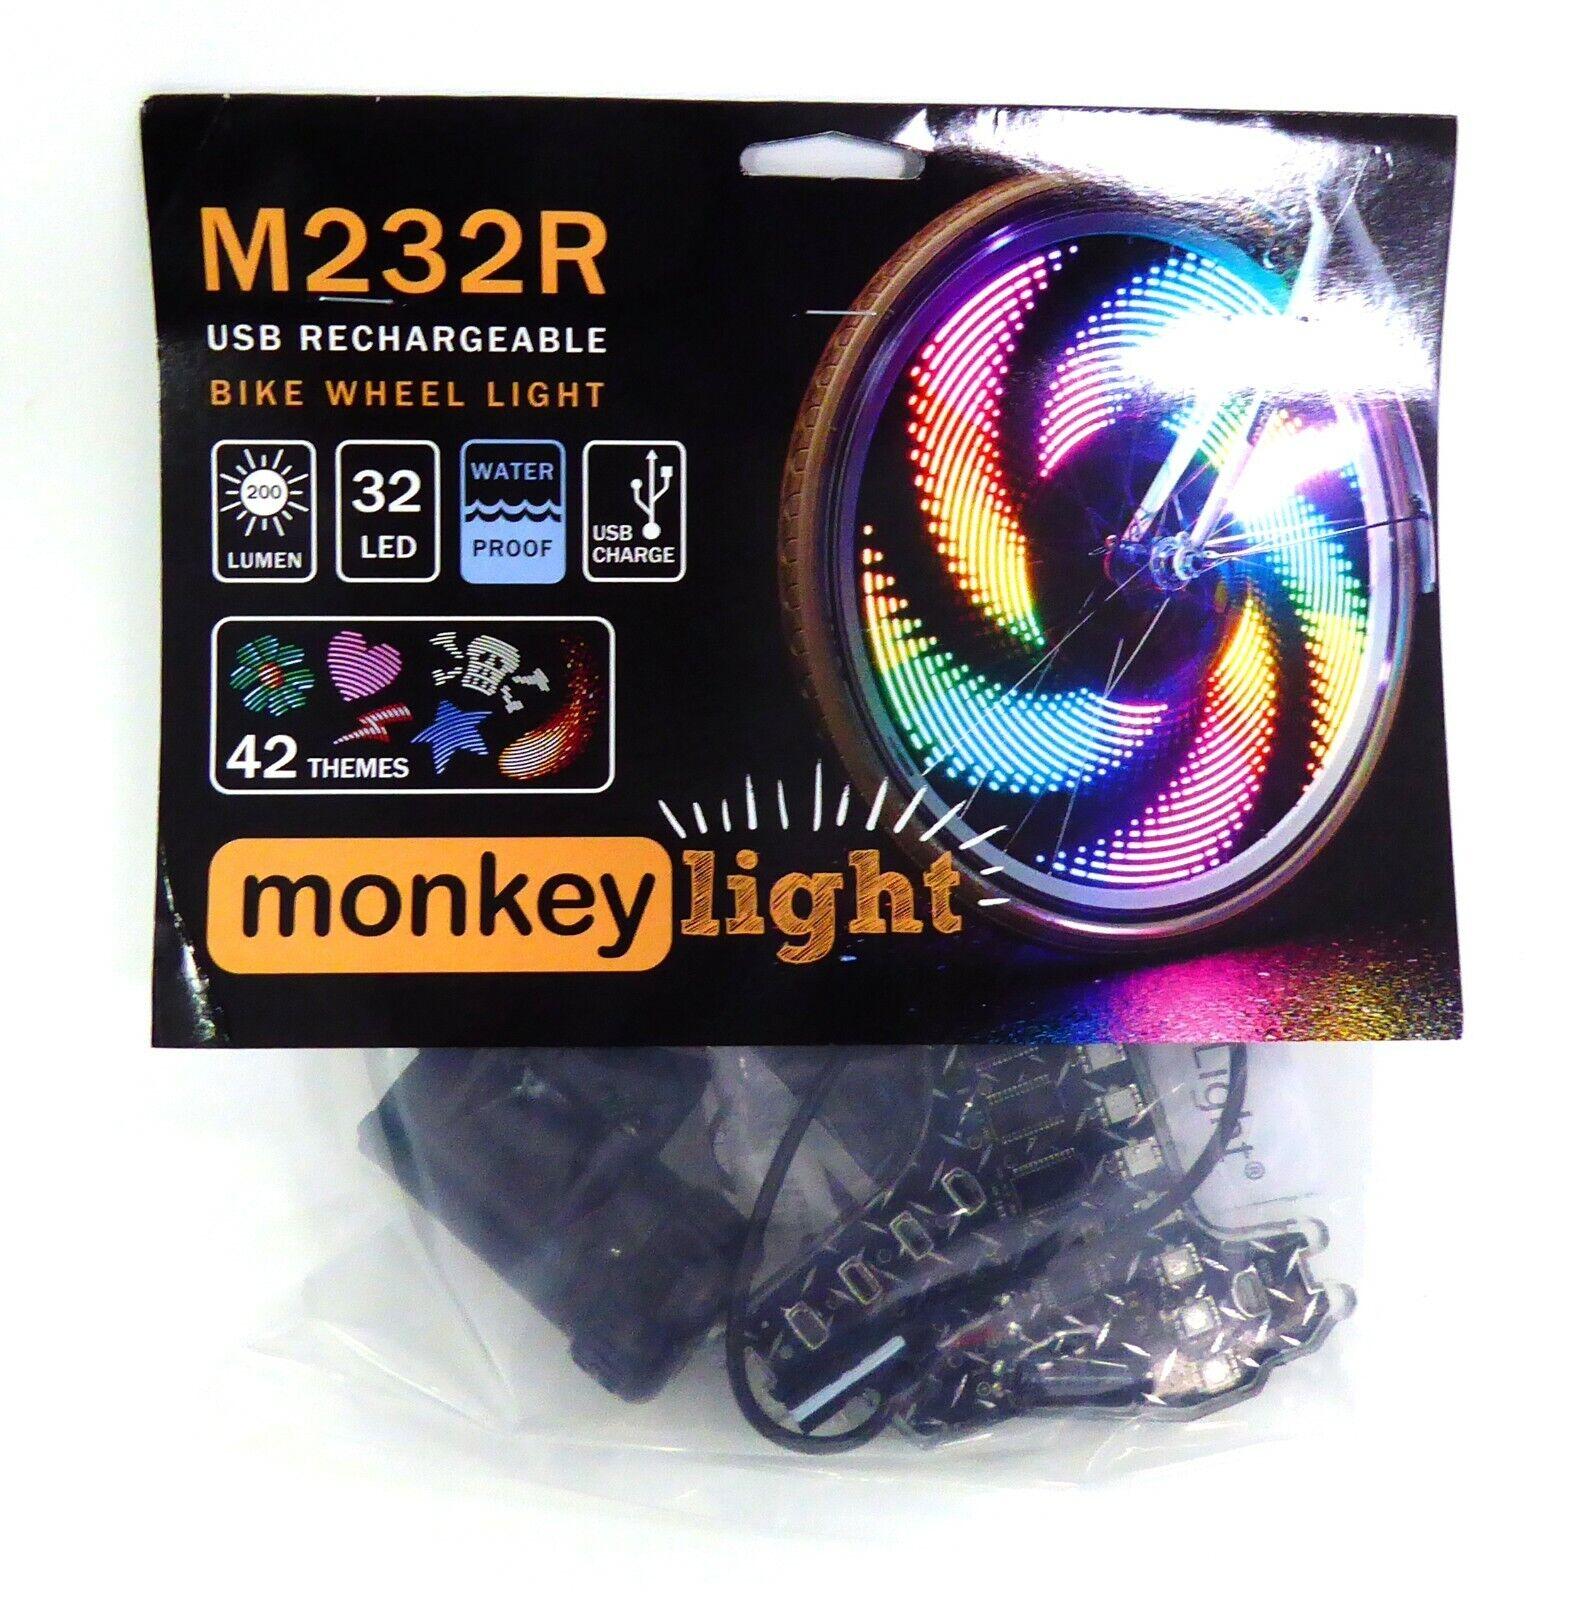 Bike Wheel Monkeylectric Battery Pack Harness Case Monkey Light M204 M210 M232